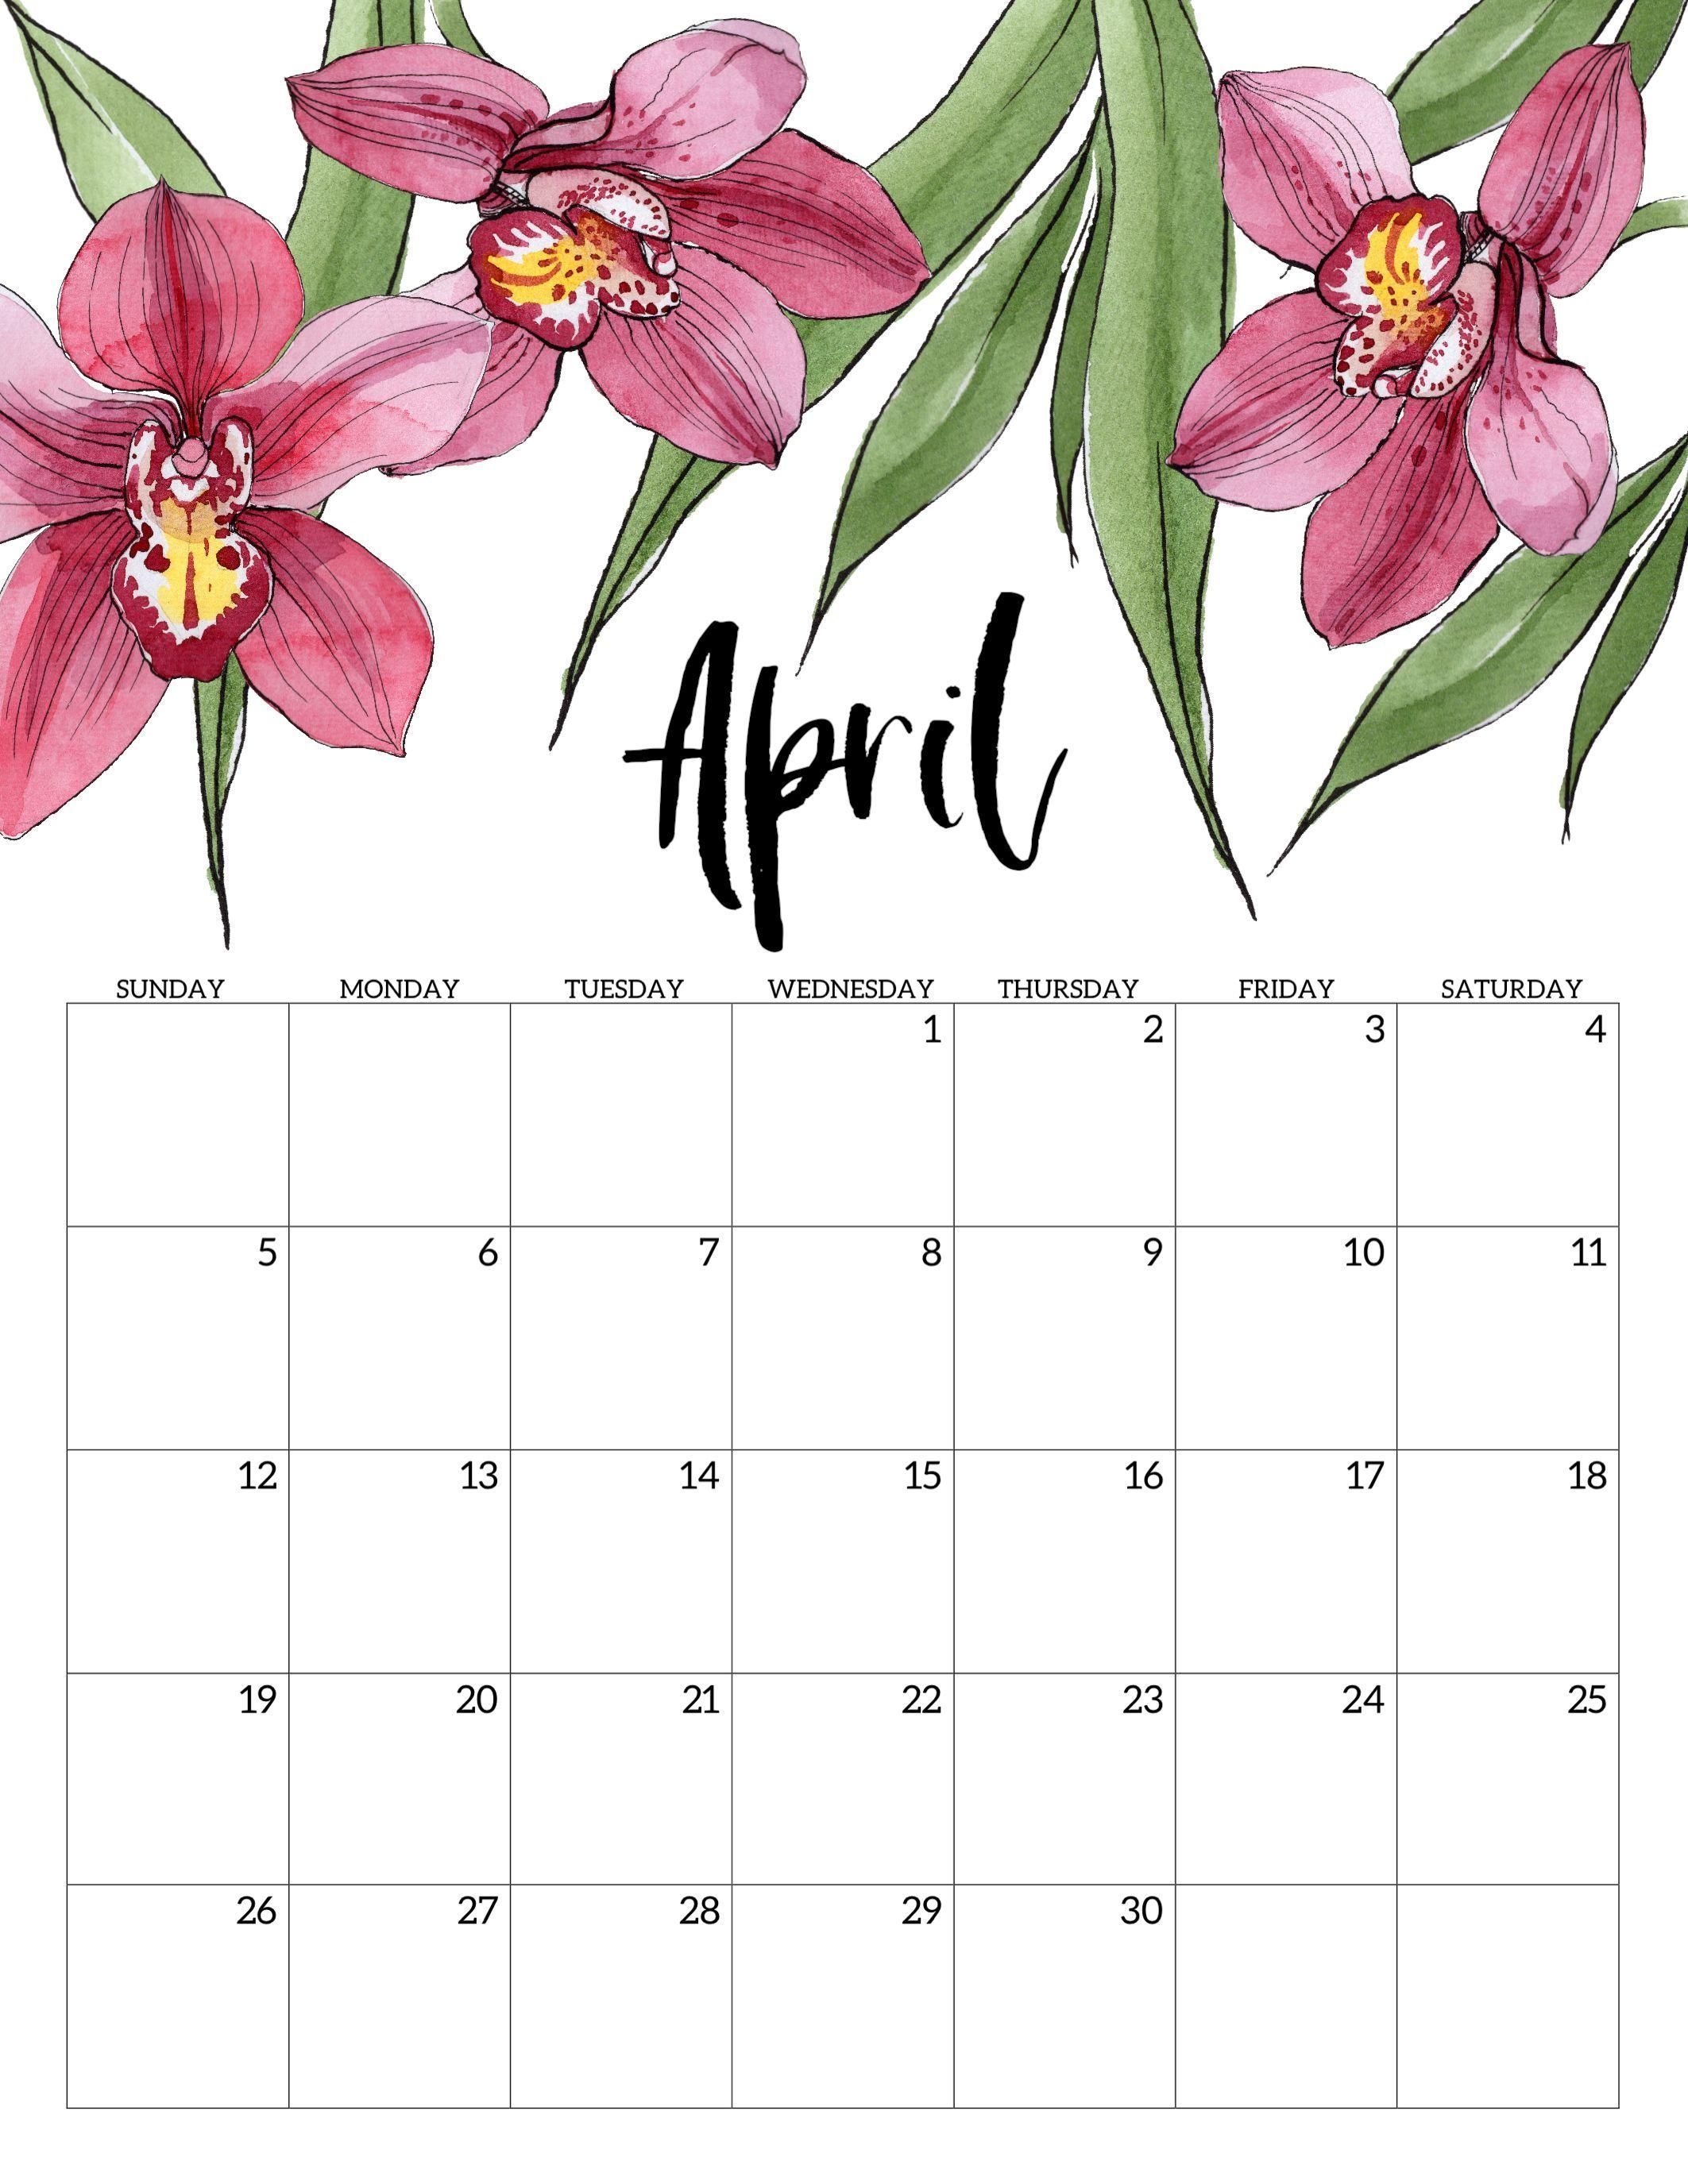 Latest Cute April 2020 Floral Calendar Hd Wallpaper In 2020 Free